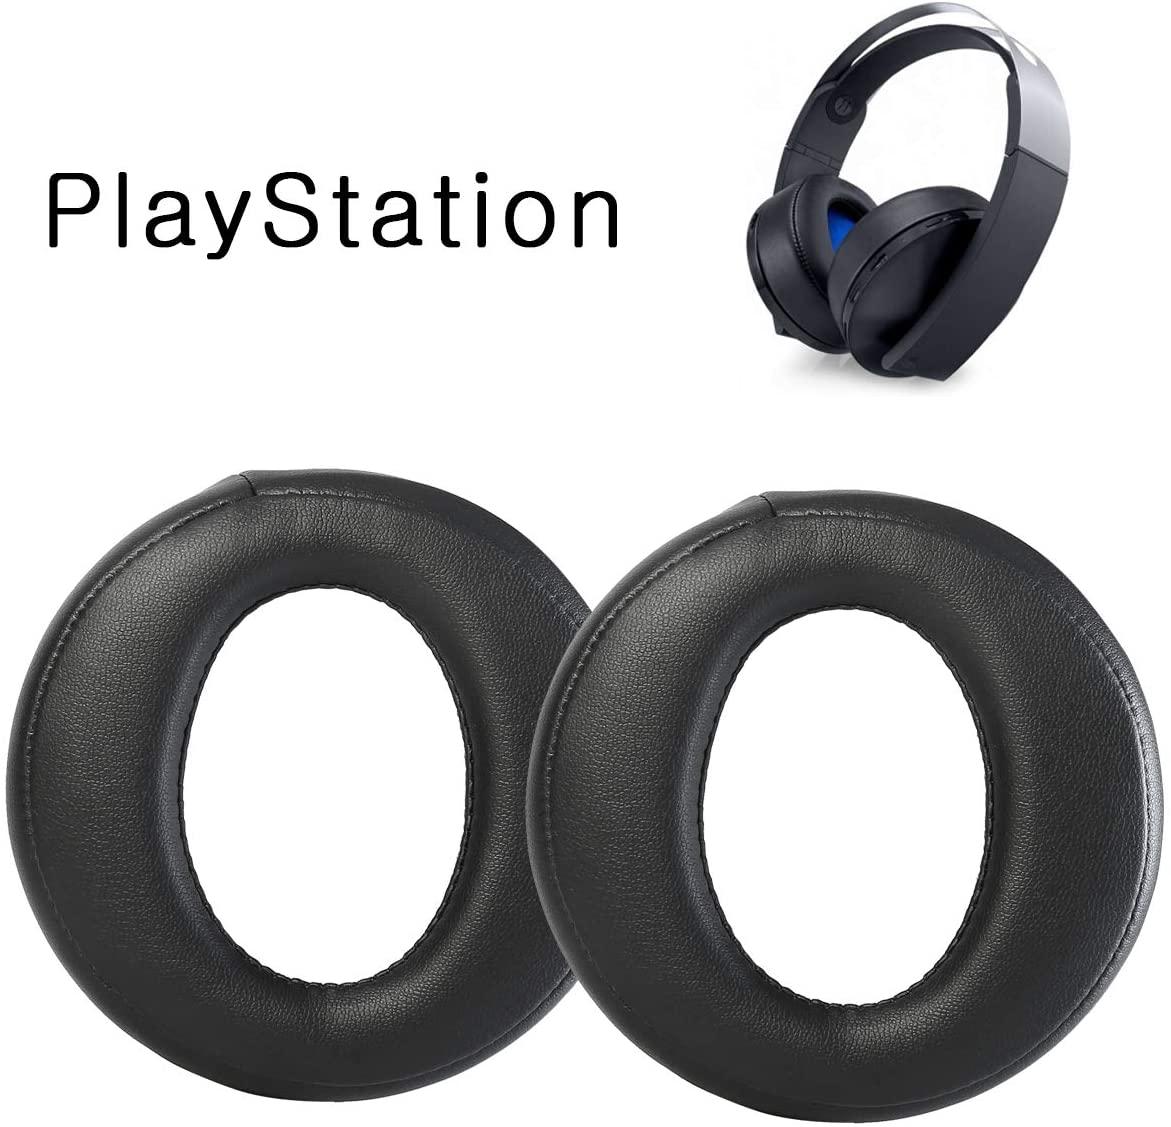 JEWAYTEC Replacement Earpads/Ear Cushion/Ear Cover for Sony Plastation PS4 Golden Wireless Headsets CECHYA-0083 7.1 Headphones-Black